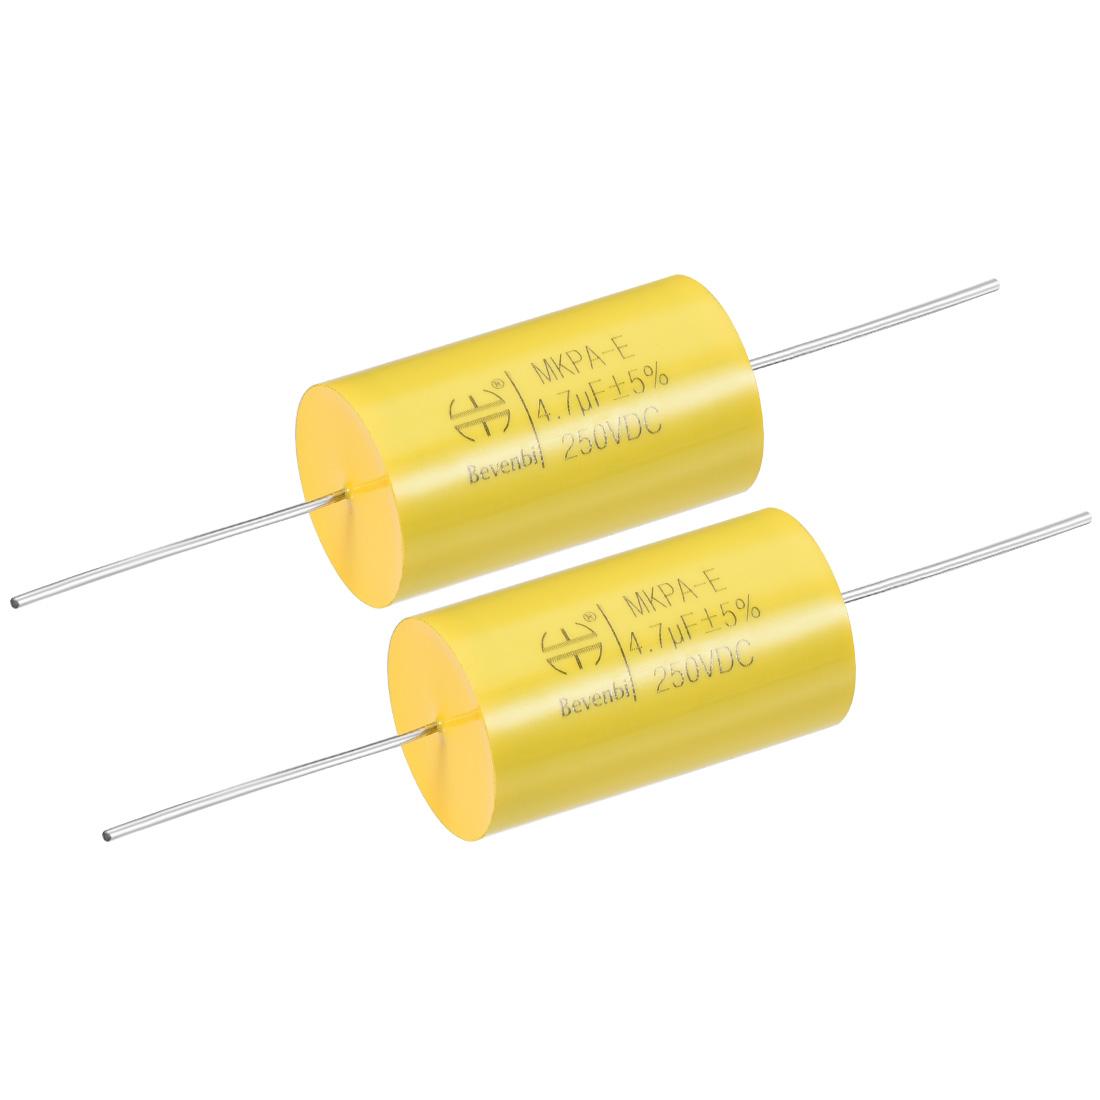 Film Capacitor 250V DC 4.7uF MKP-E Round Polypropylene Capacitors Yellow 2pcs